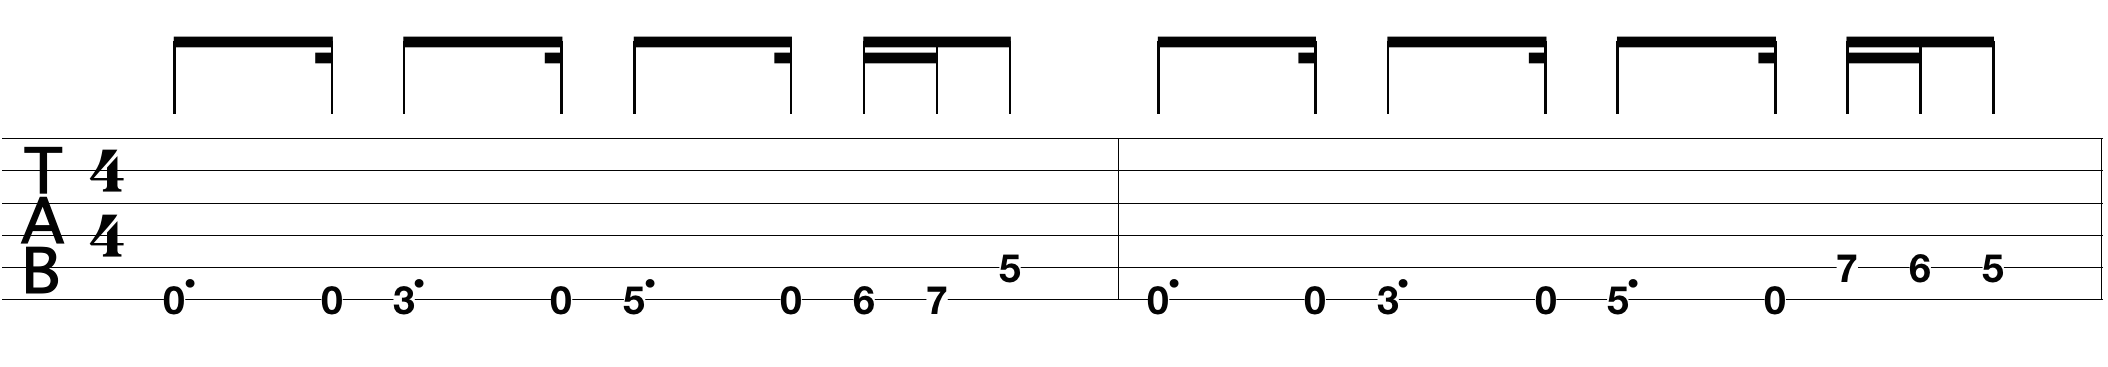 guitar-riffs-easy_1.png